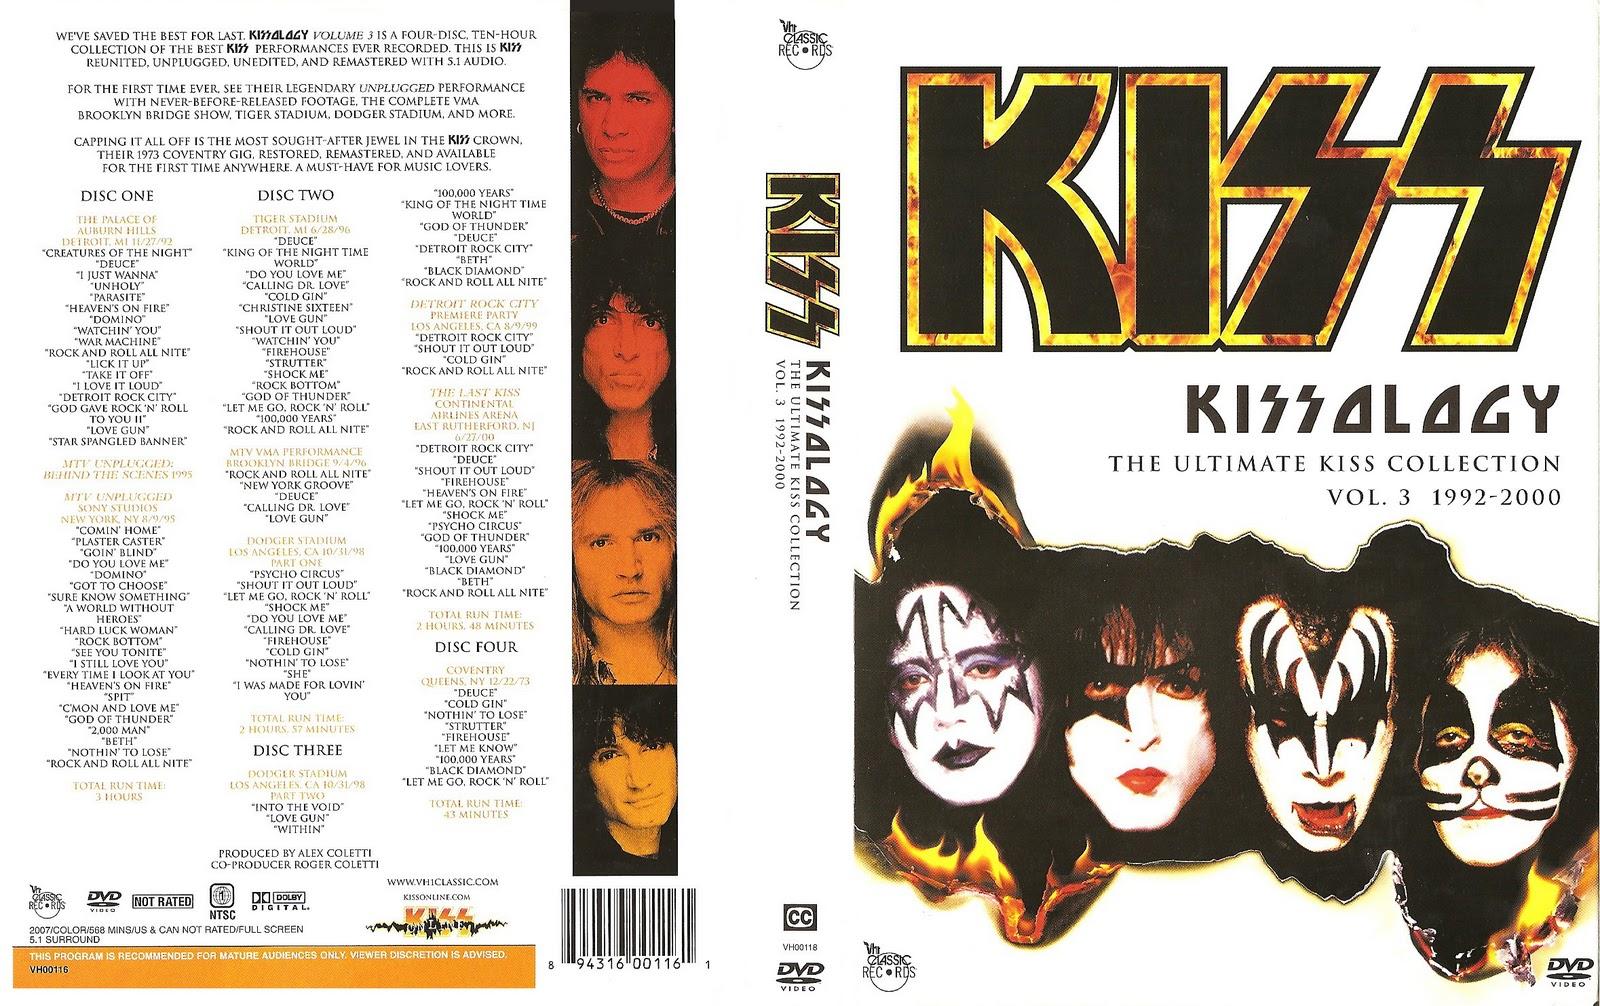 Noronha 180 S Trader Kiss Kissology Vol 03 1992 2000